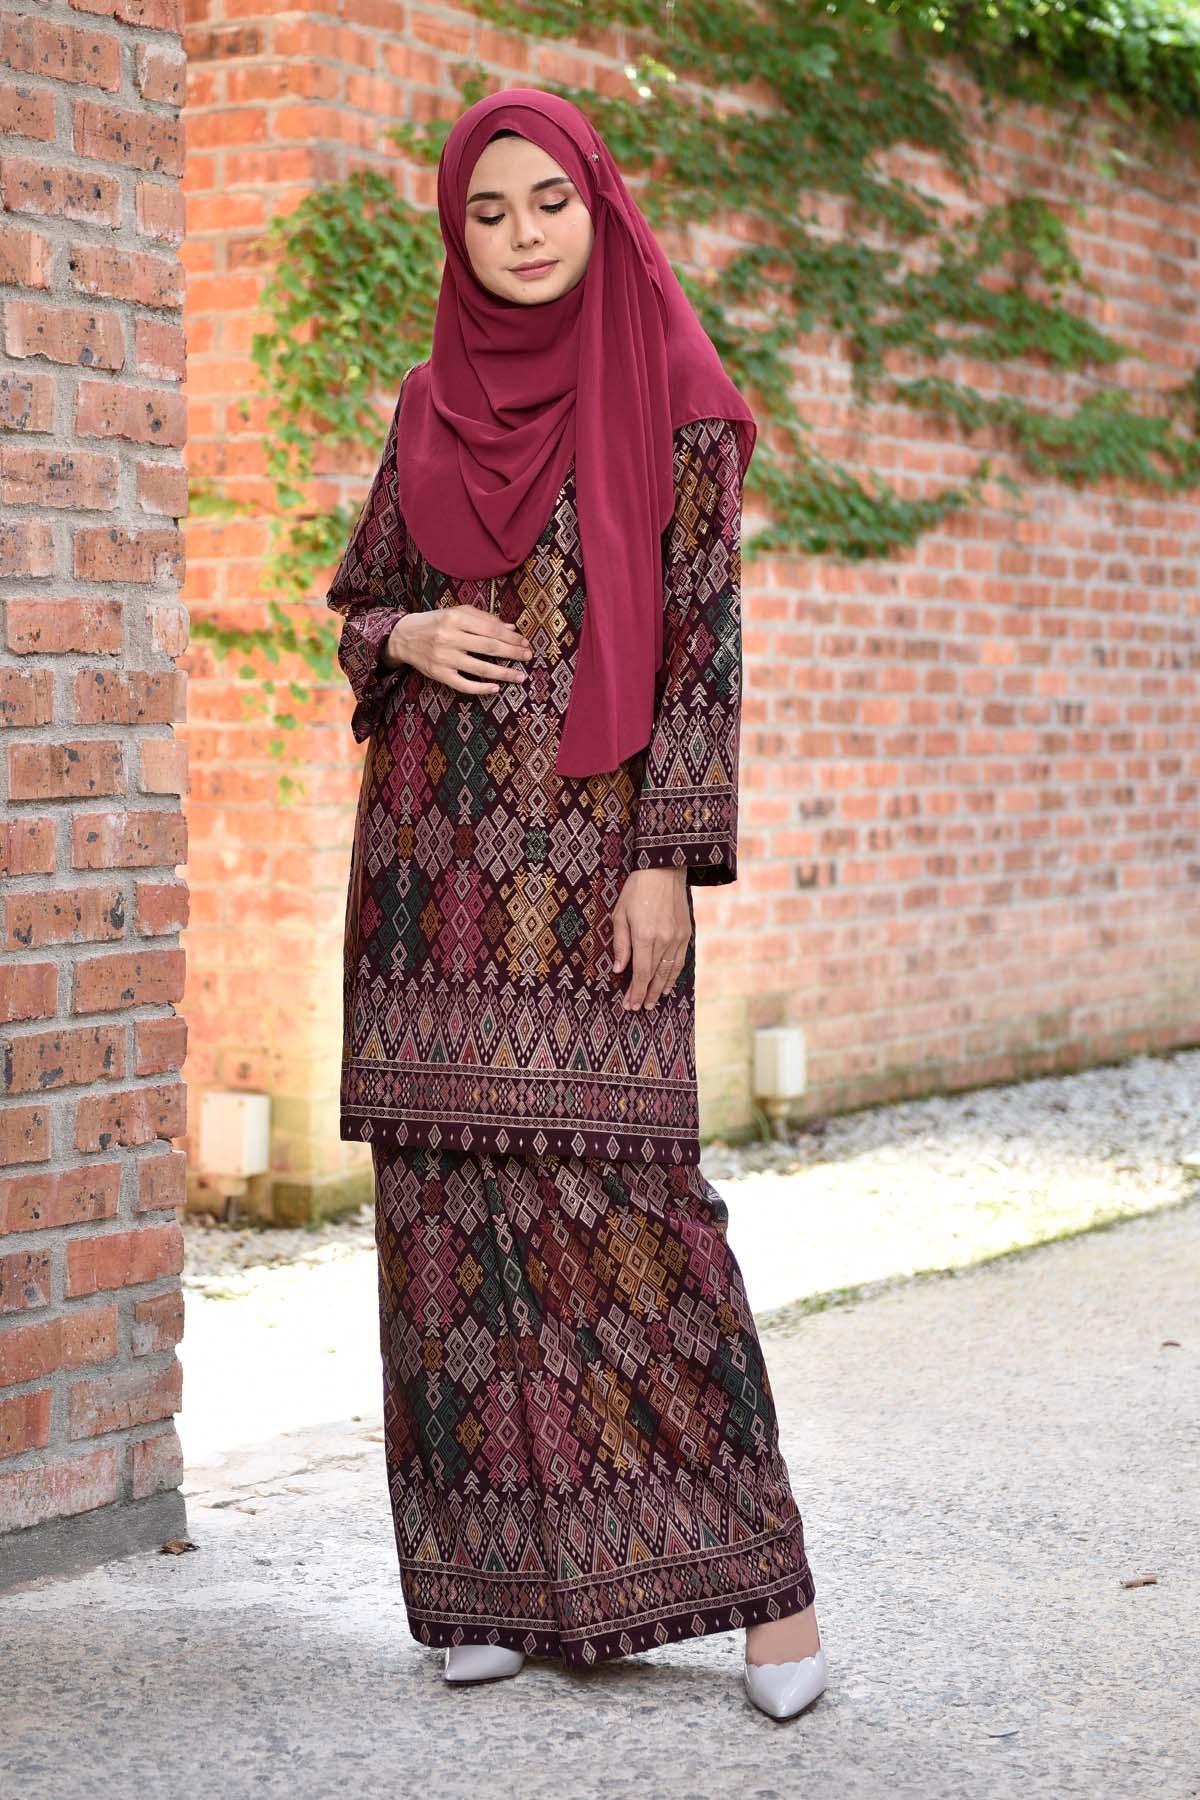 Model Bridesmaid Hijab Batik H9d9 Baju Kurung songket Luella Deep Maroon